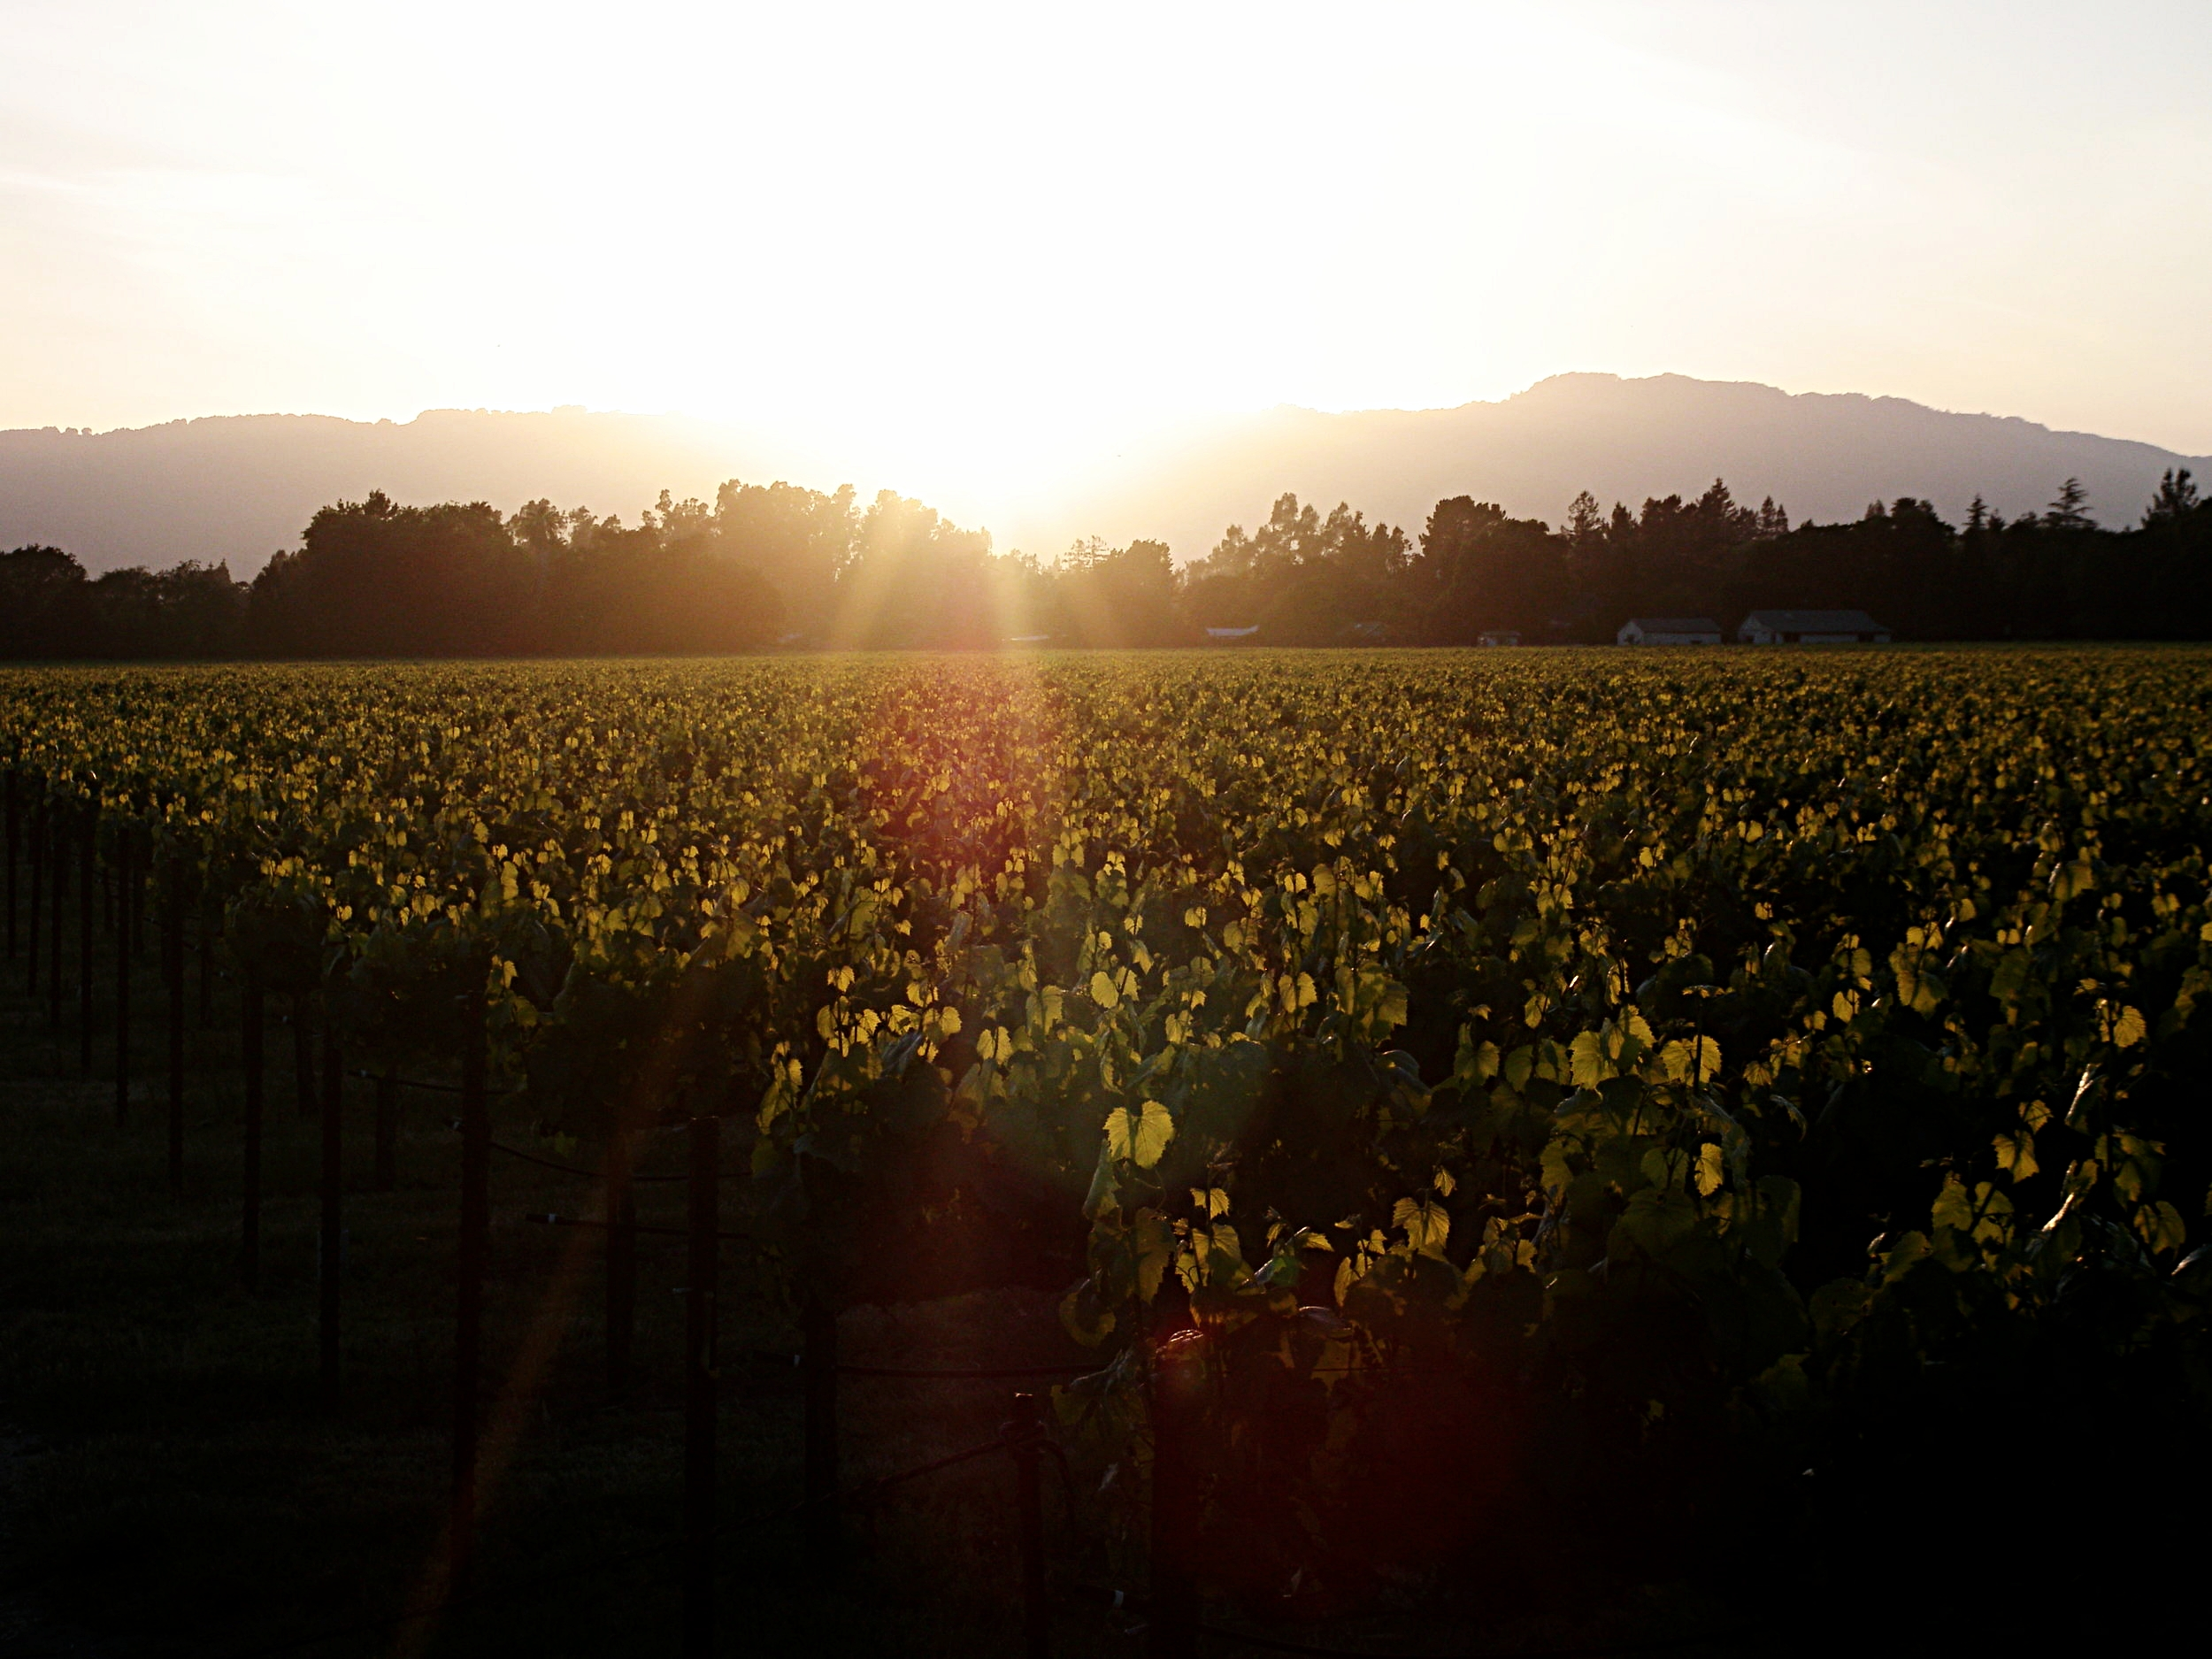 sonoma city public works, engineering + solar projects | sonoma, california | usa